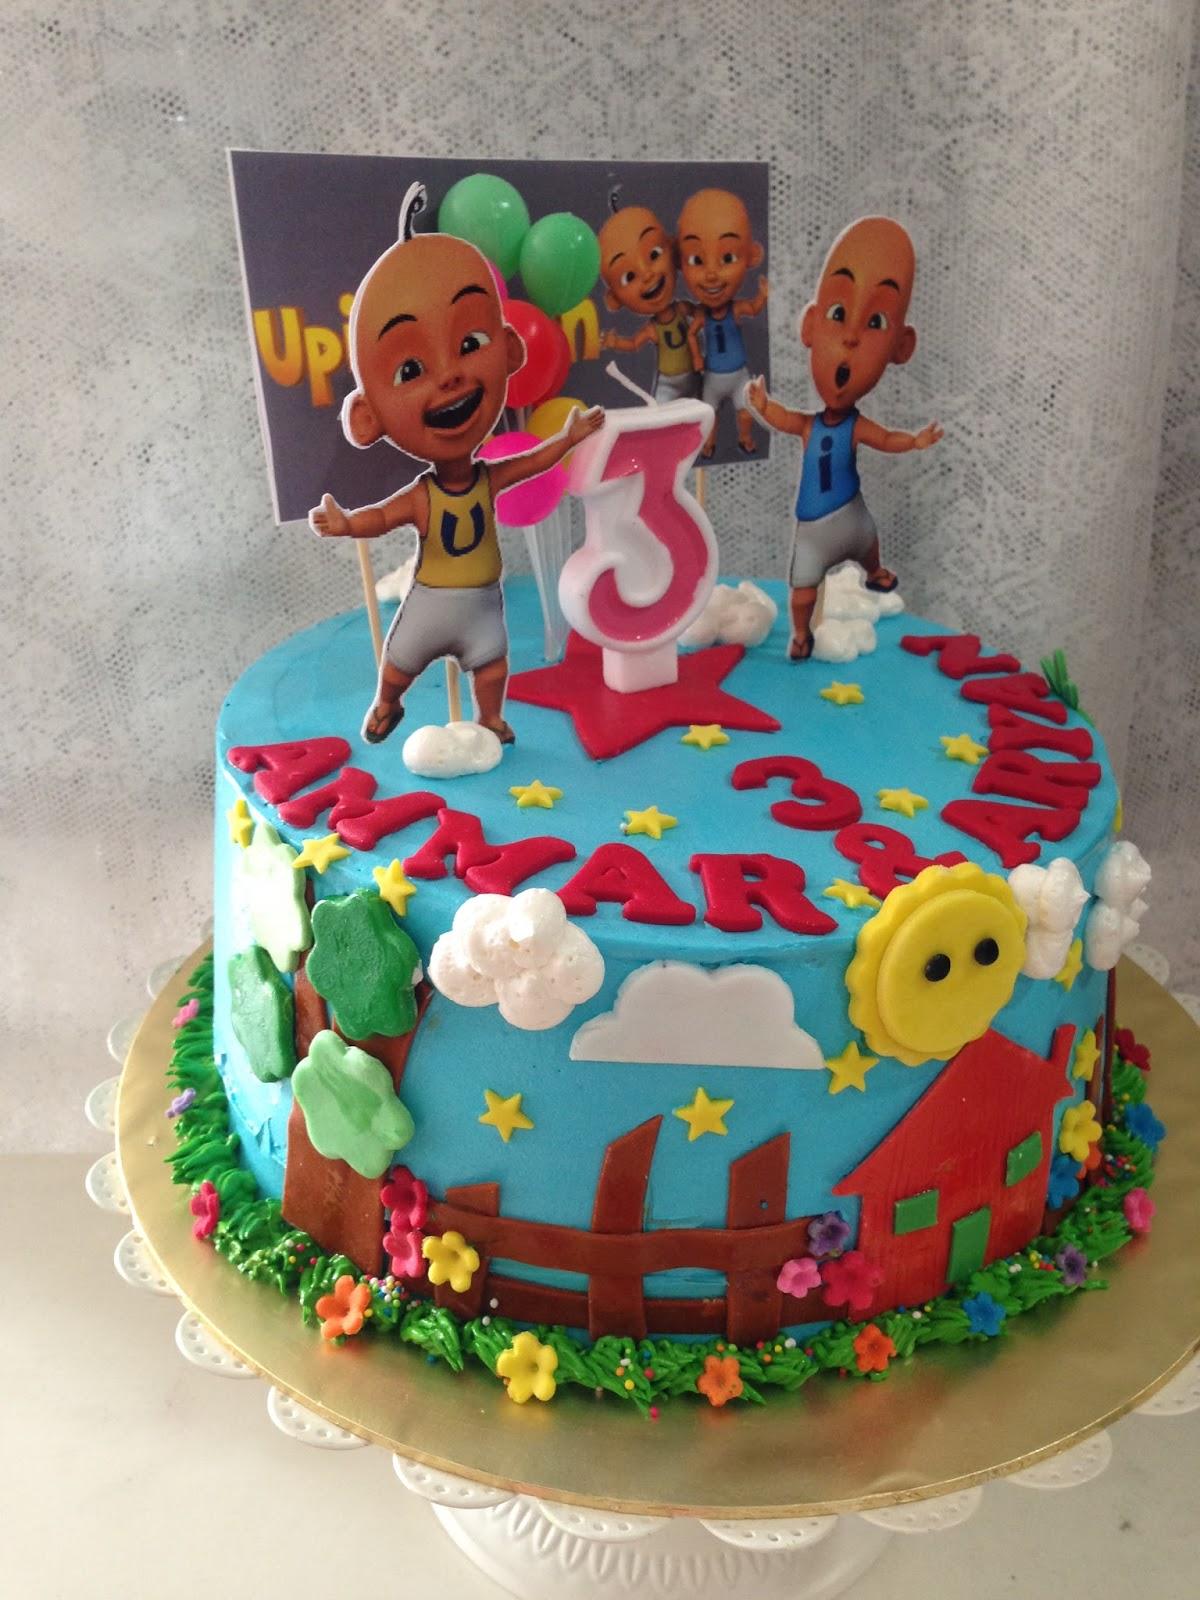 ninie cakes house: Upin & Ipin Birthday Cakes Theme